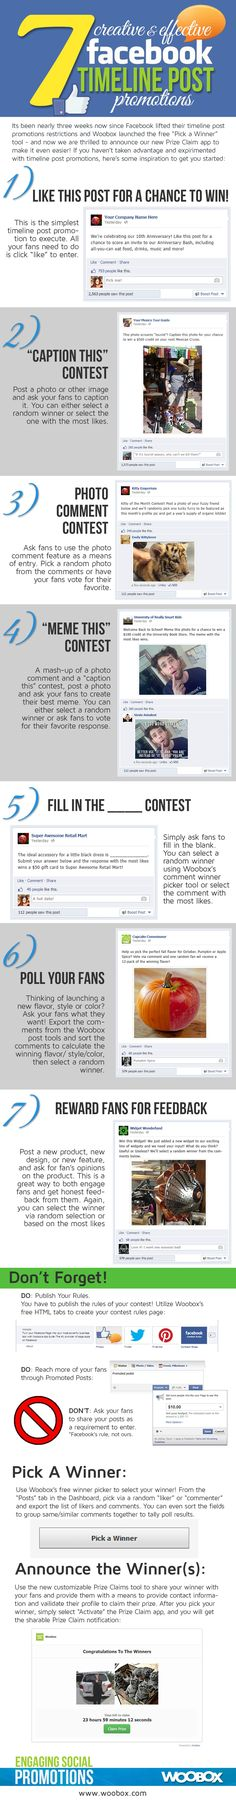 Facebook timeline promotion ideas via @angela4design